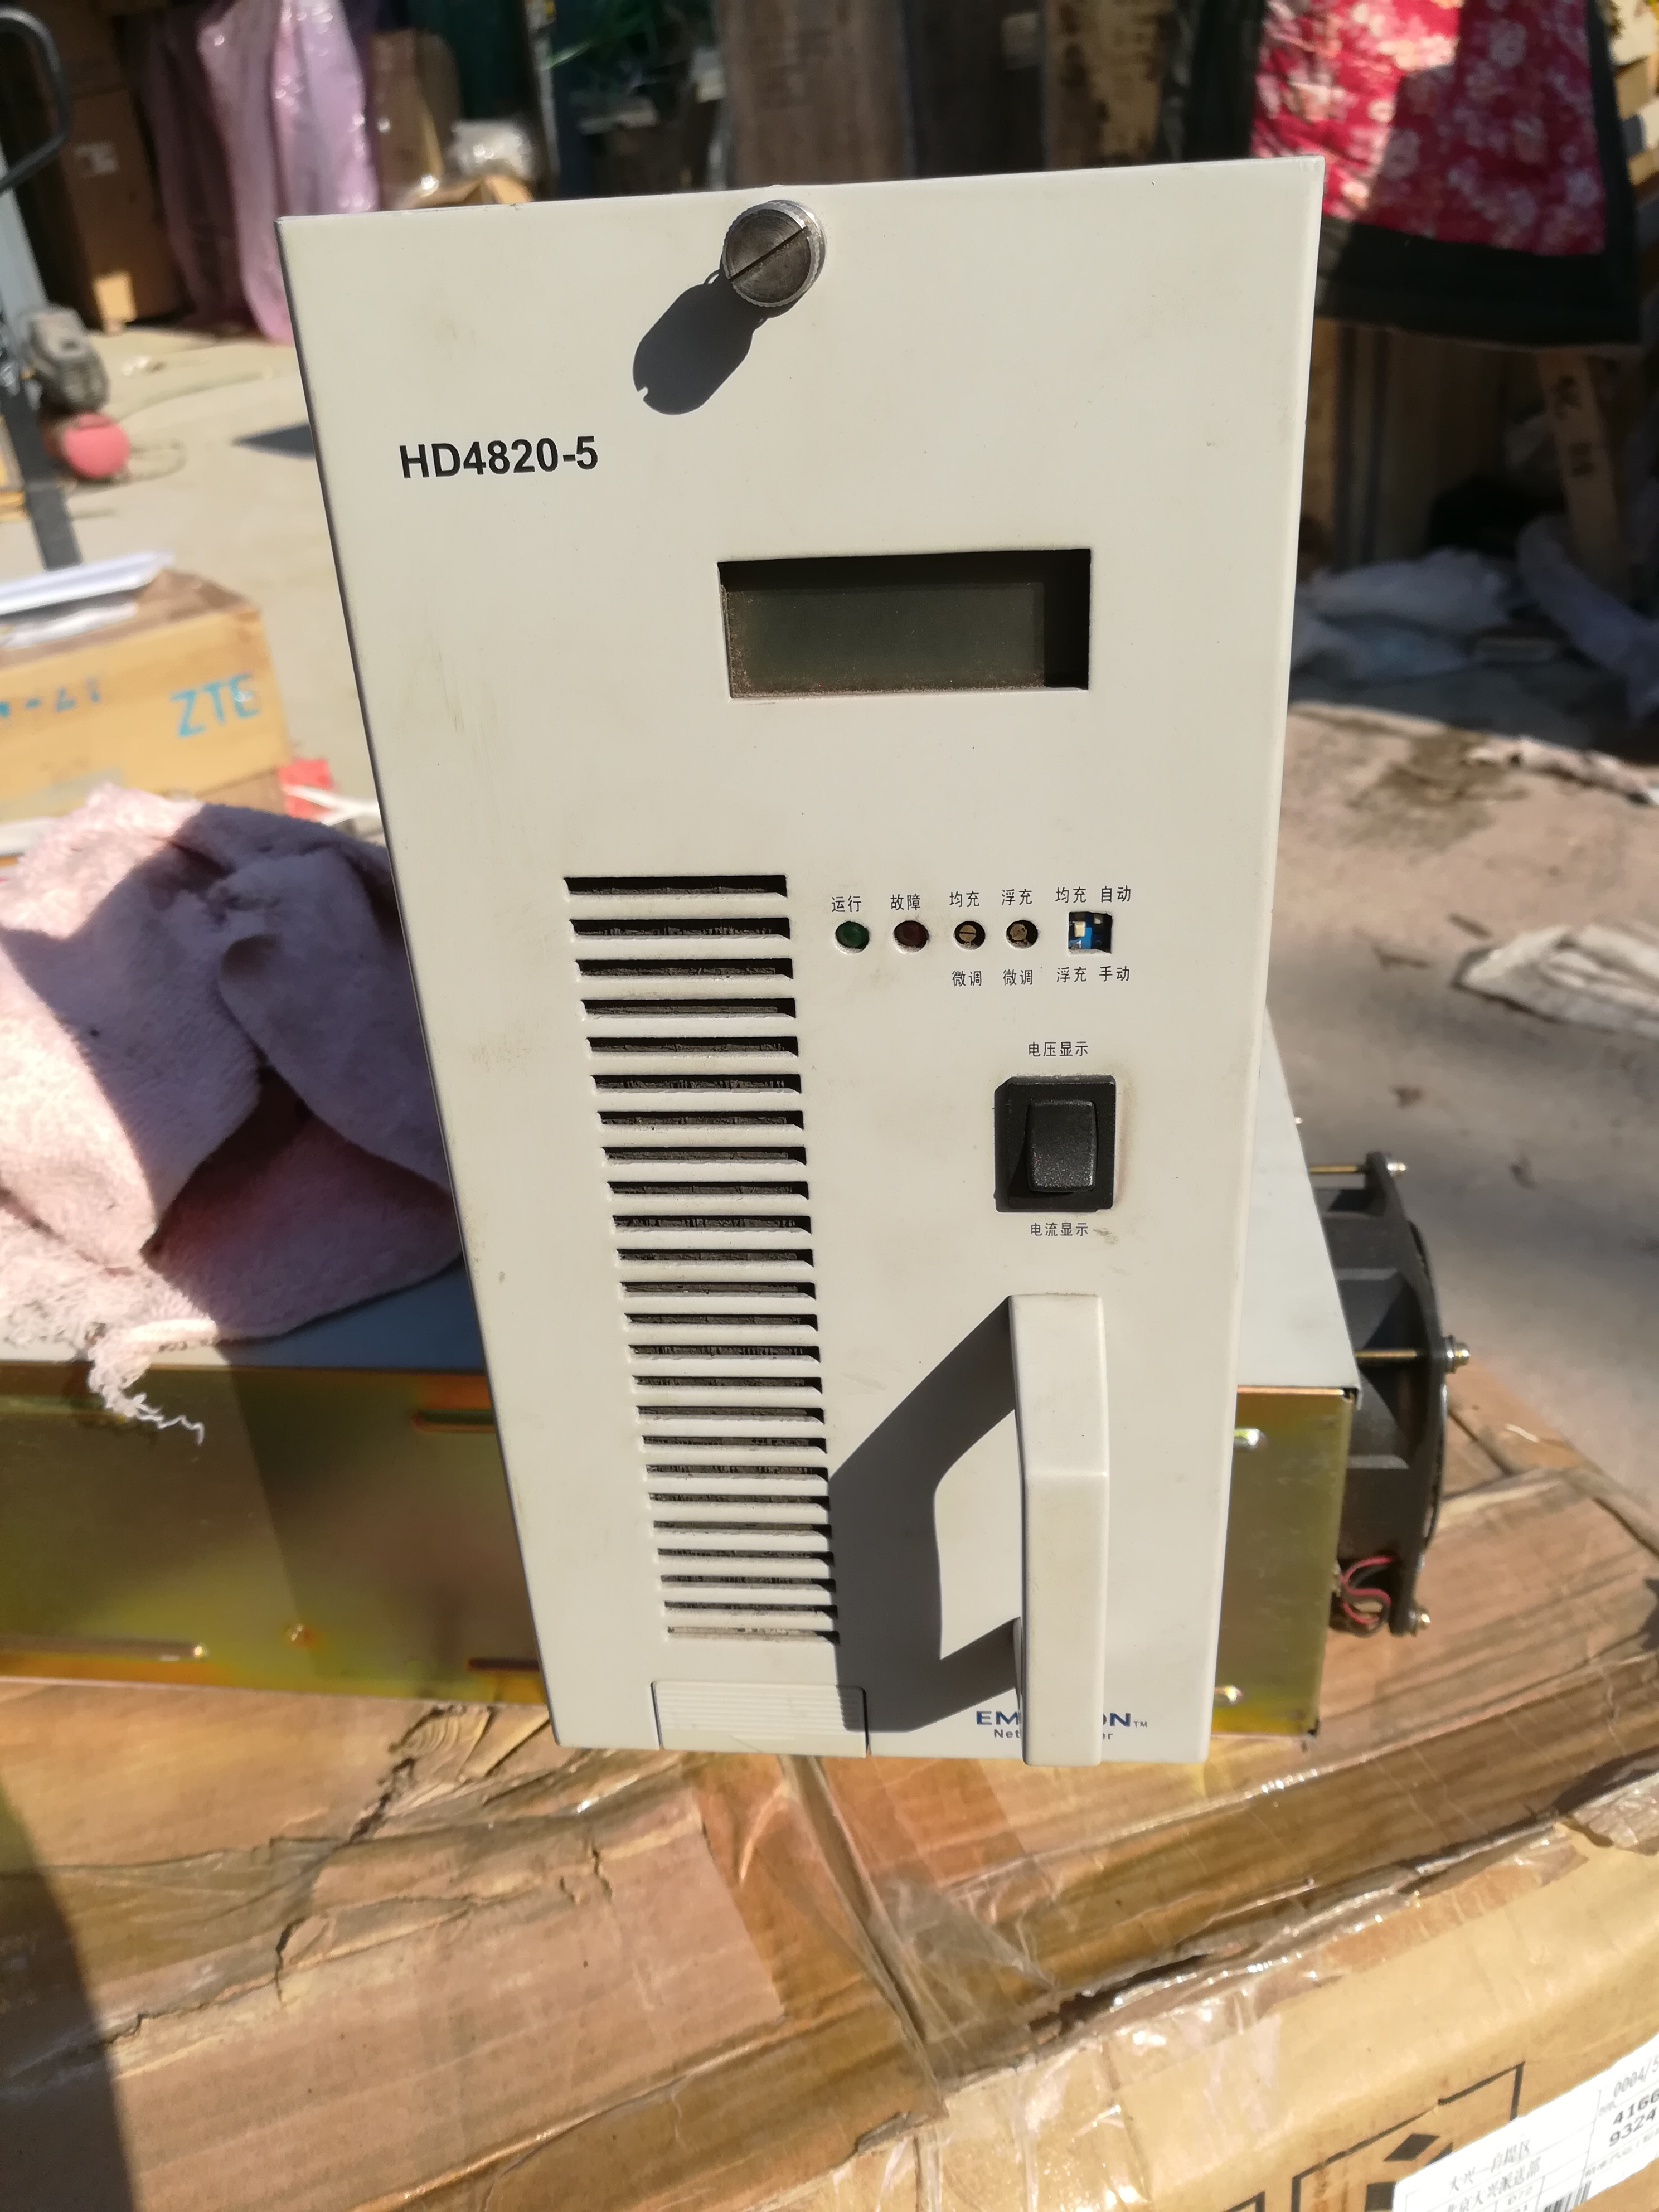 Emerson HD4820-5 power module